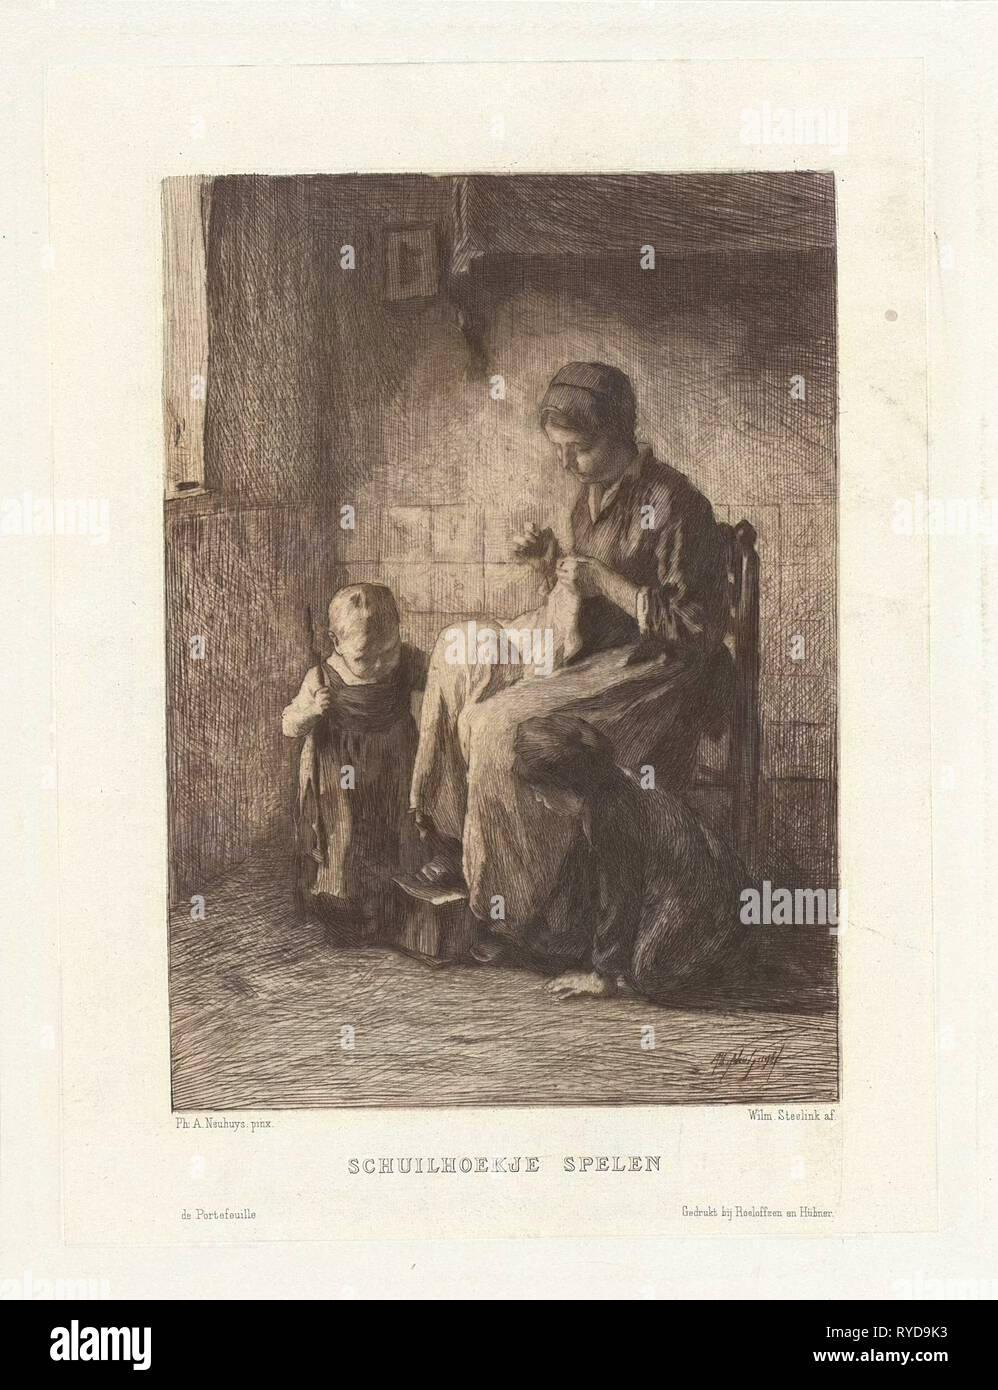 Playing hide and seek, Willem Steelink (II), Roeloffzen & Hübner, 1866 - 1928 - Stock Image